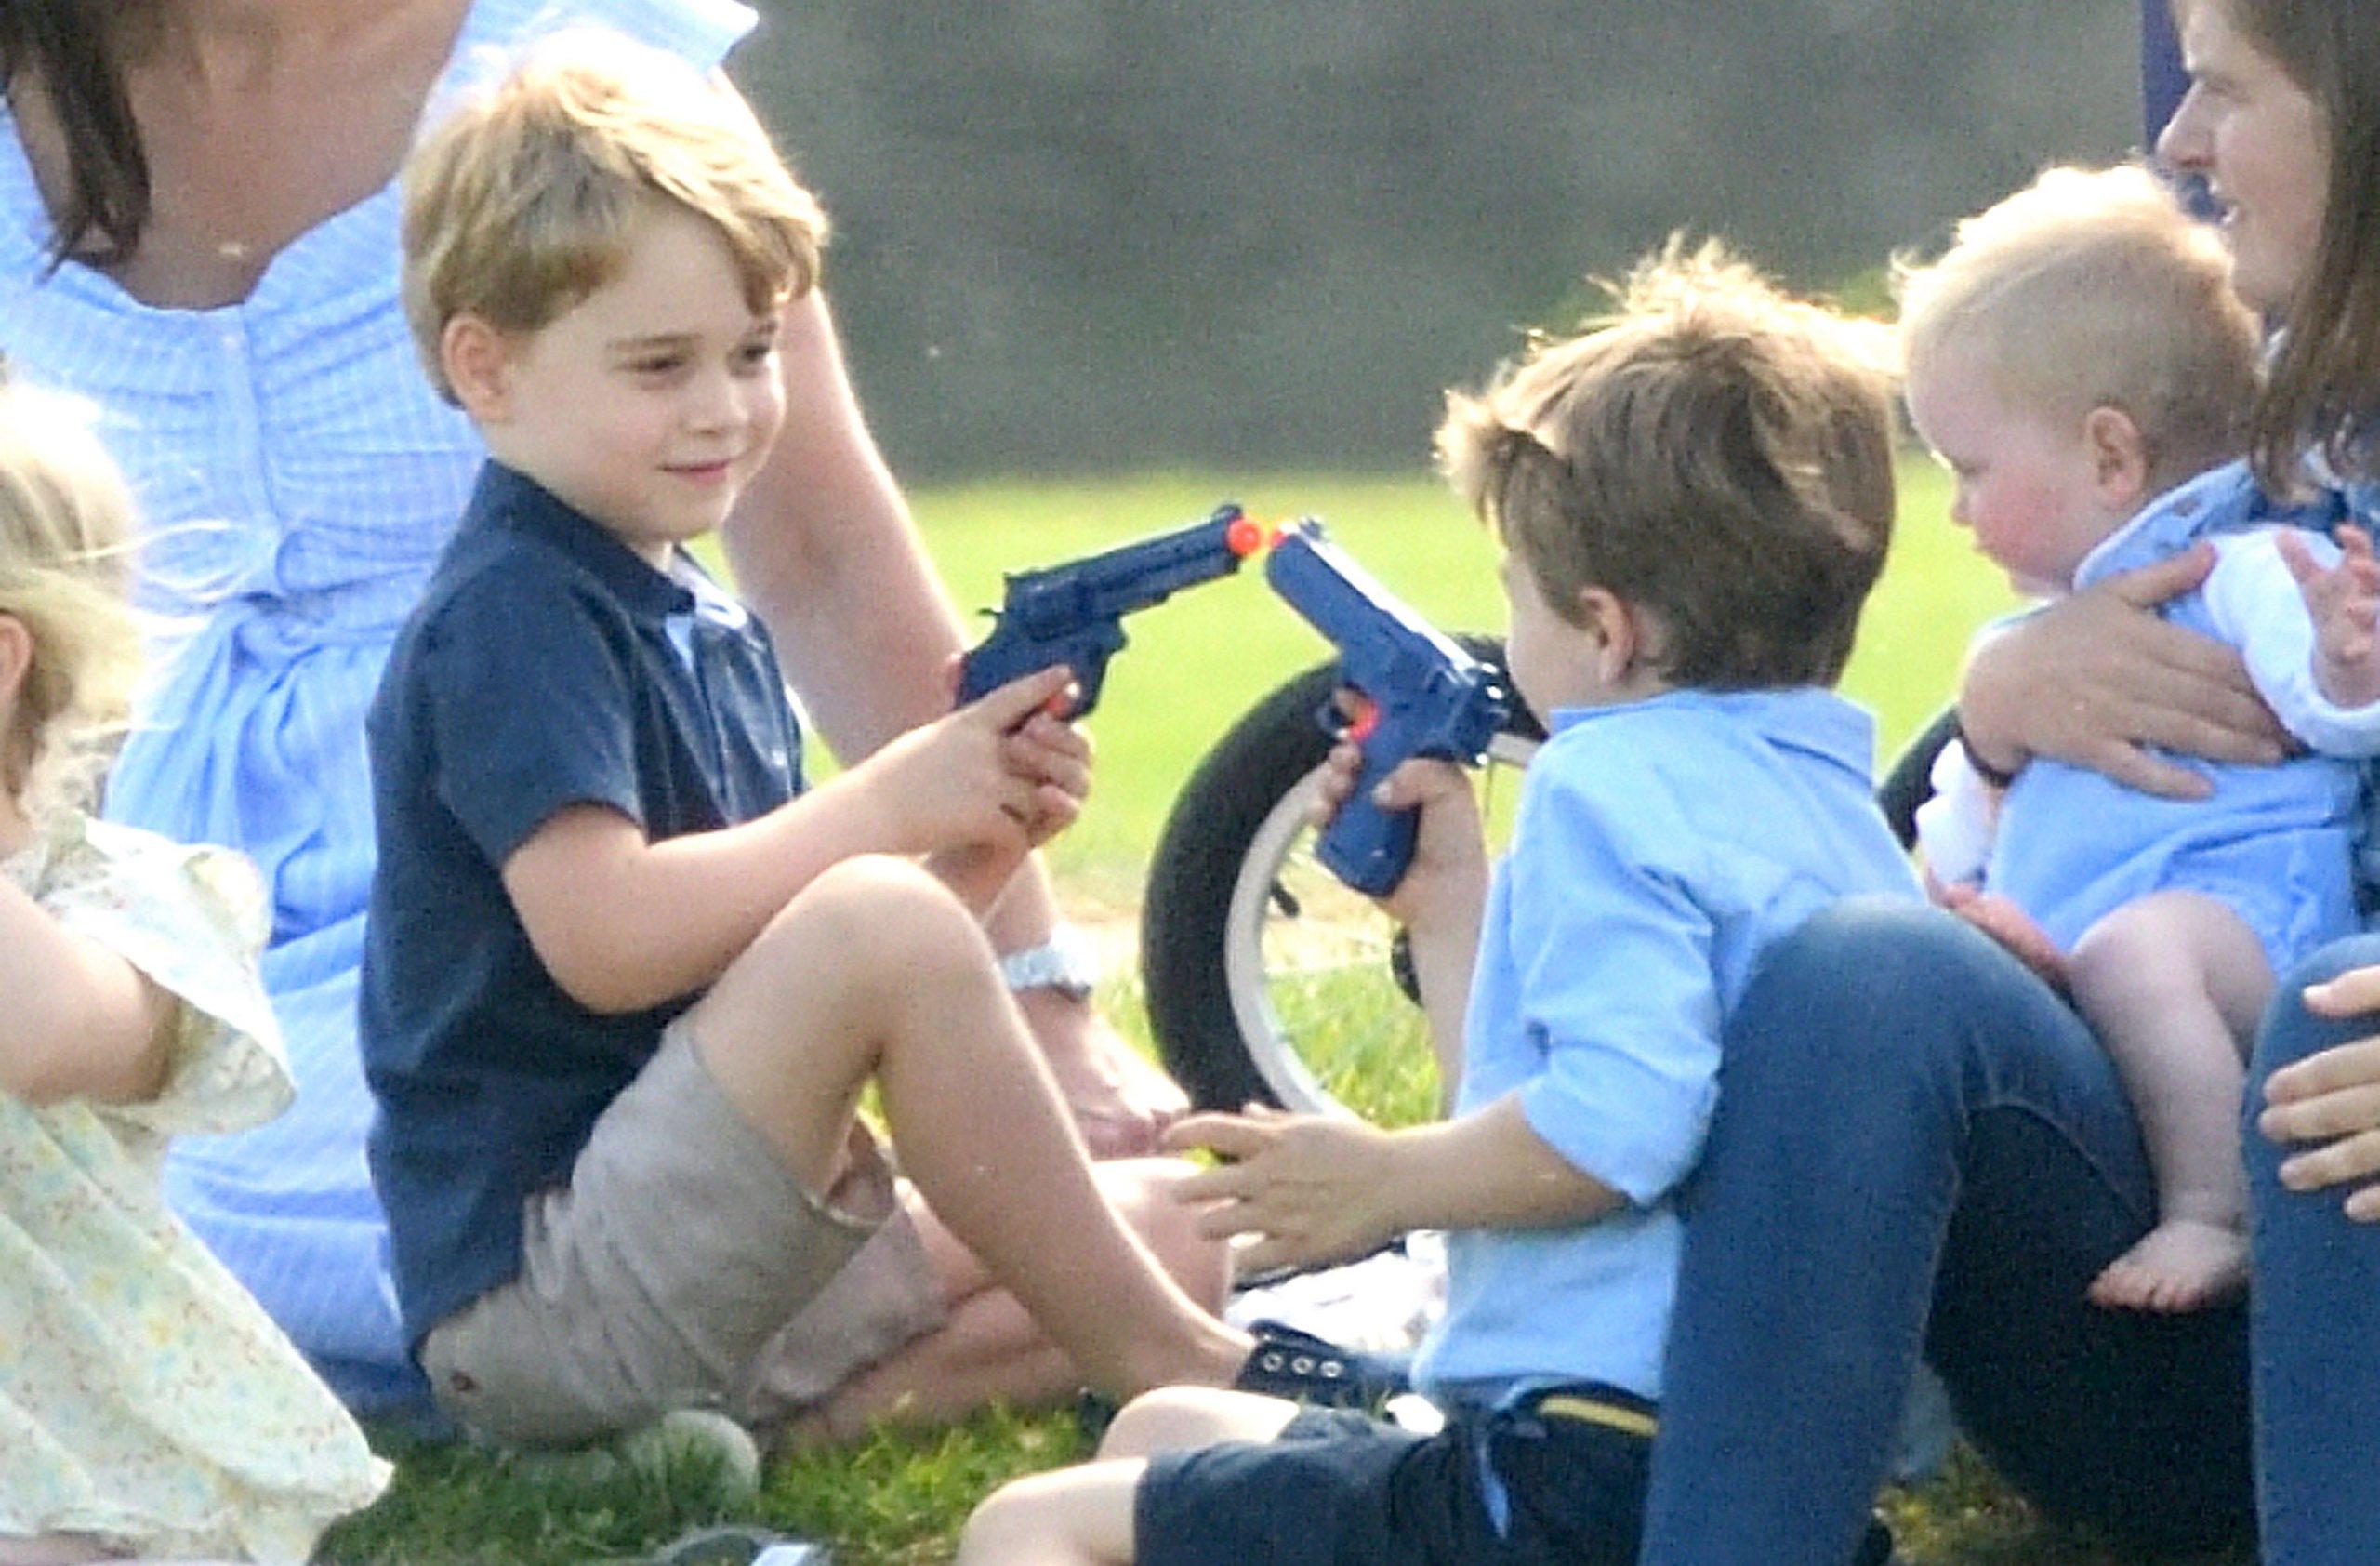 prince george toy gun